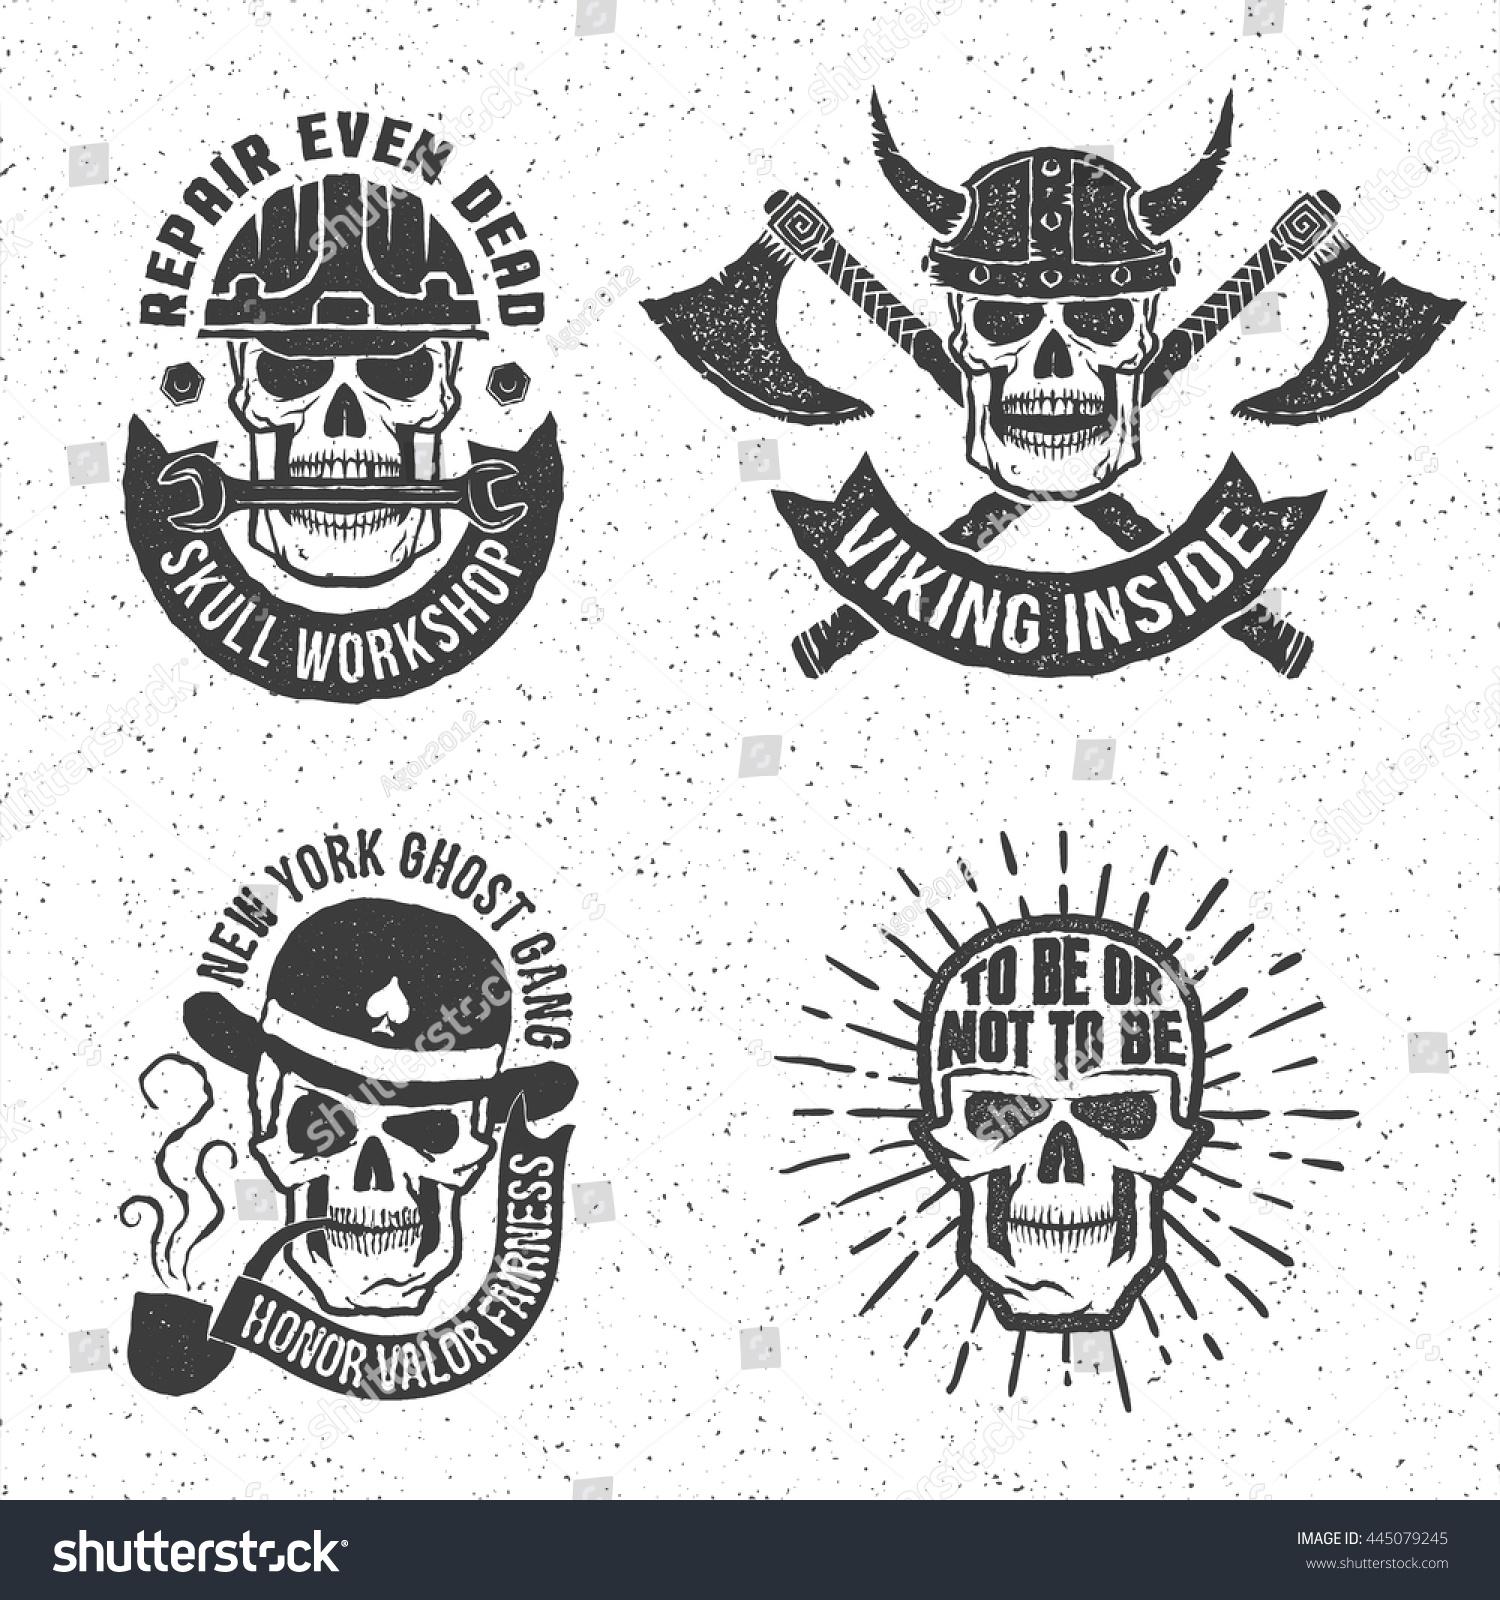 Vintage Skull Emblems With Letterpress Or Rubber Stamp Effect Background On Separate Layer Vector